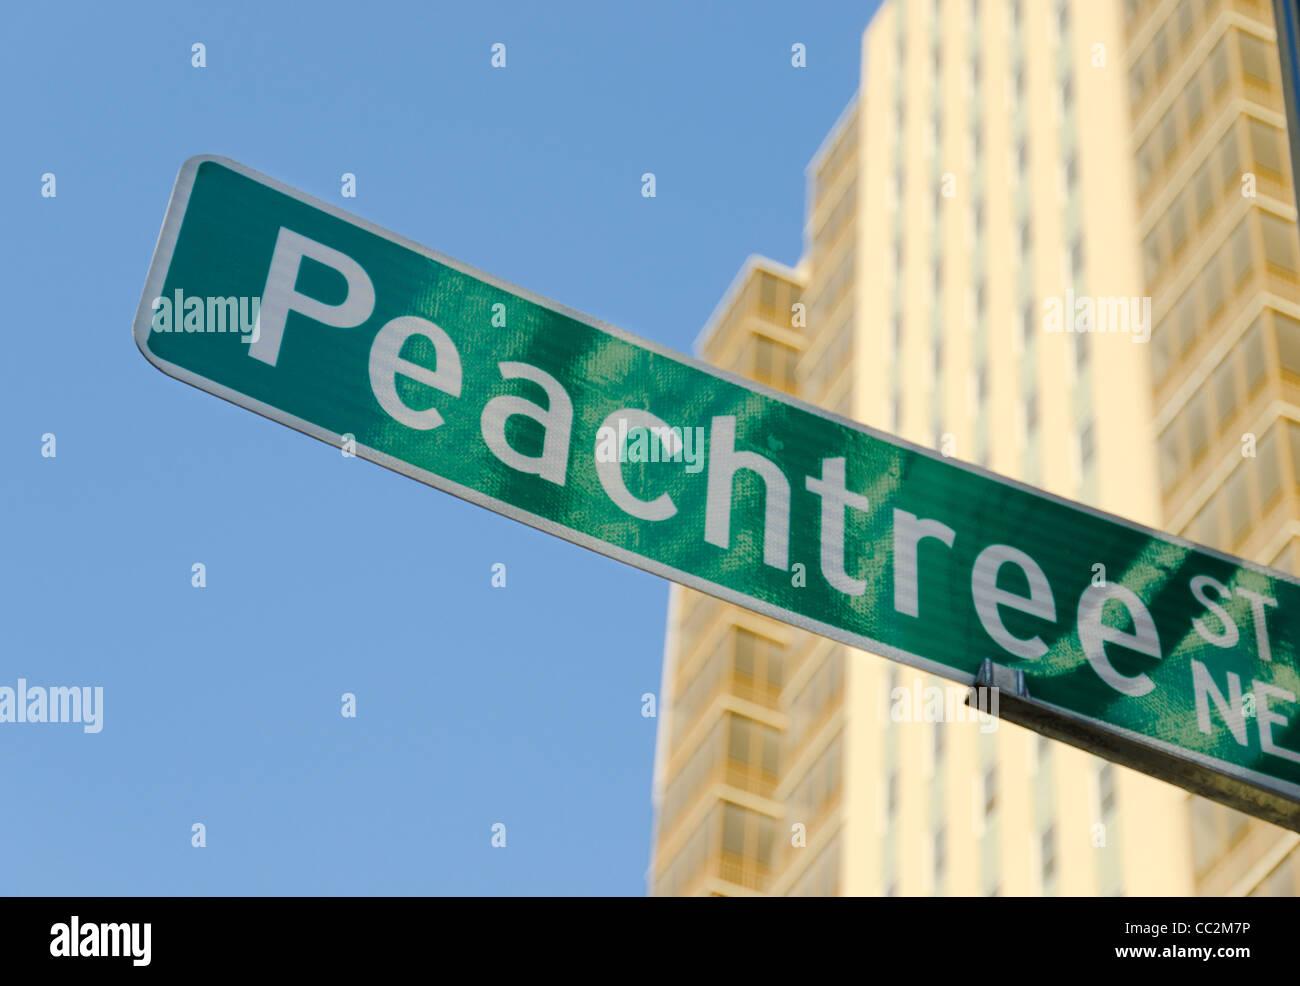 USA, Georgia, Atlanta, Low angle view of Peachtree Center - Stock Image